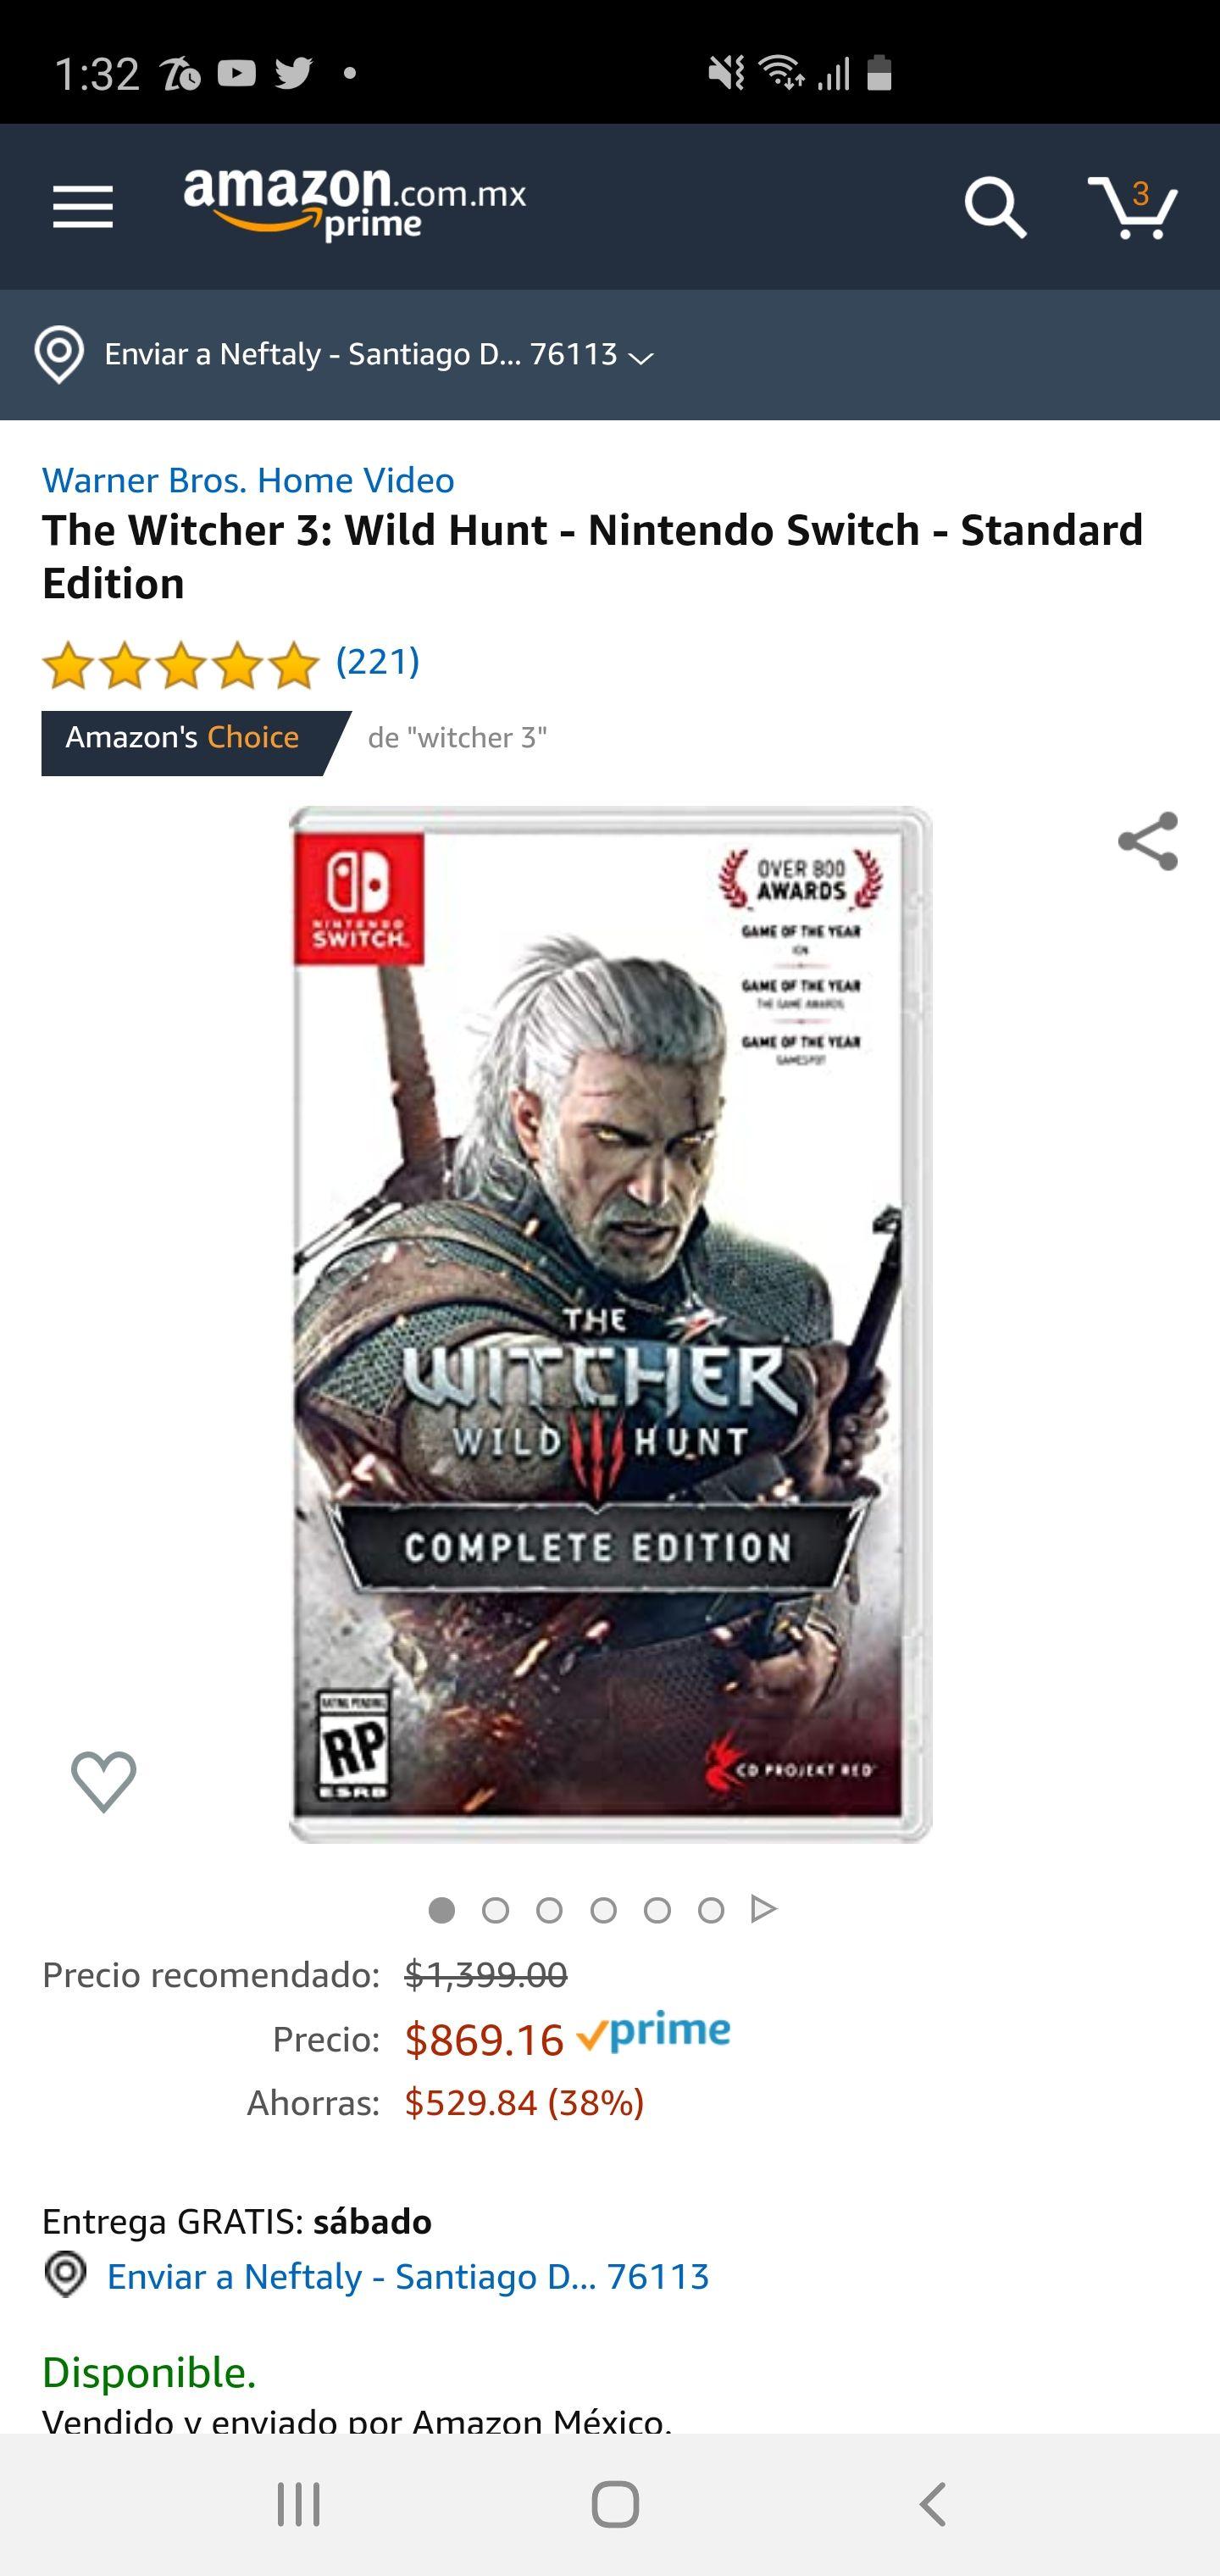 Amazon: The Witcher 3 Wild Hunt - Nintendo Switch - Standard Edition